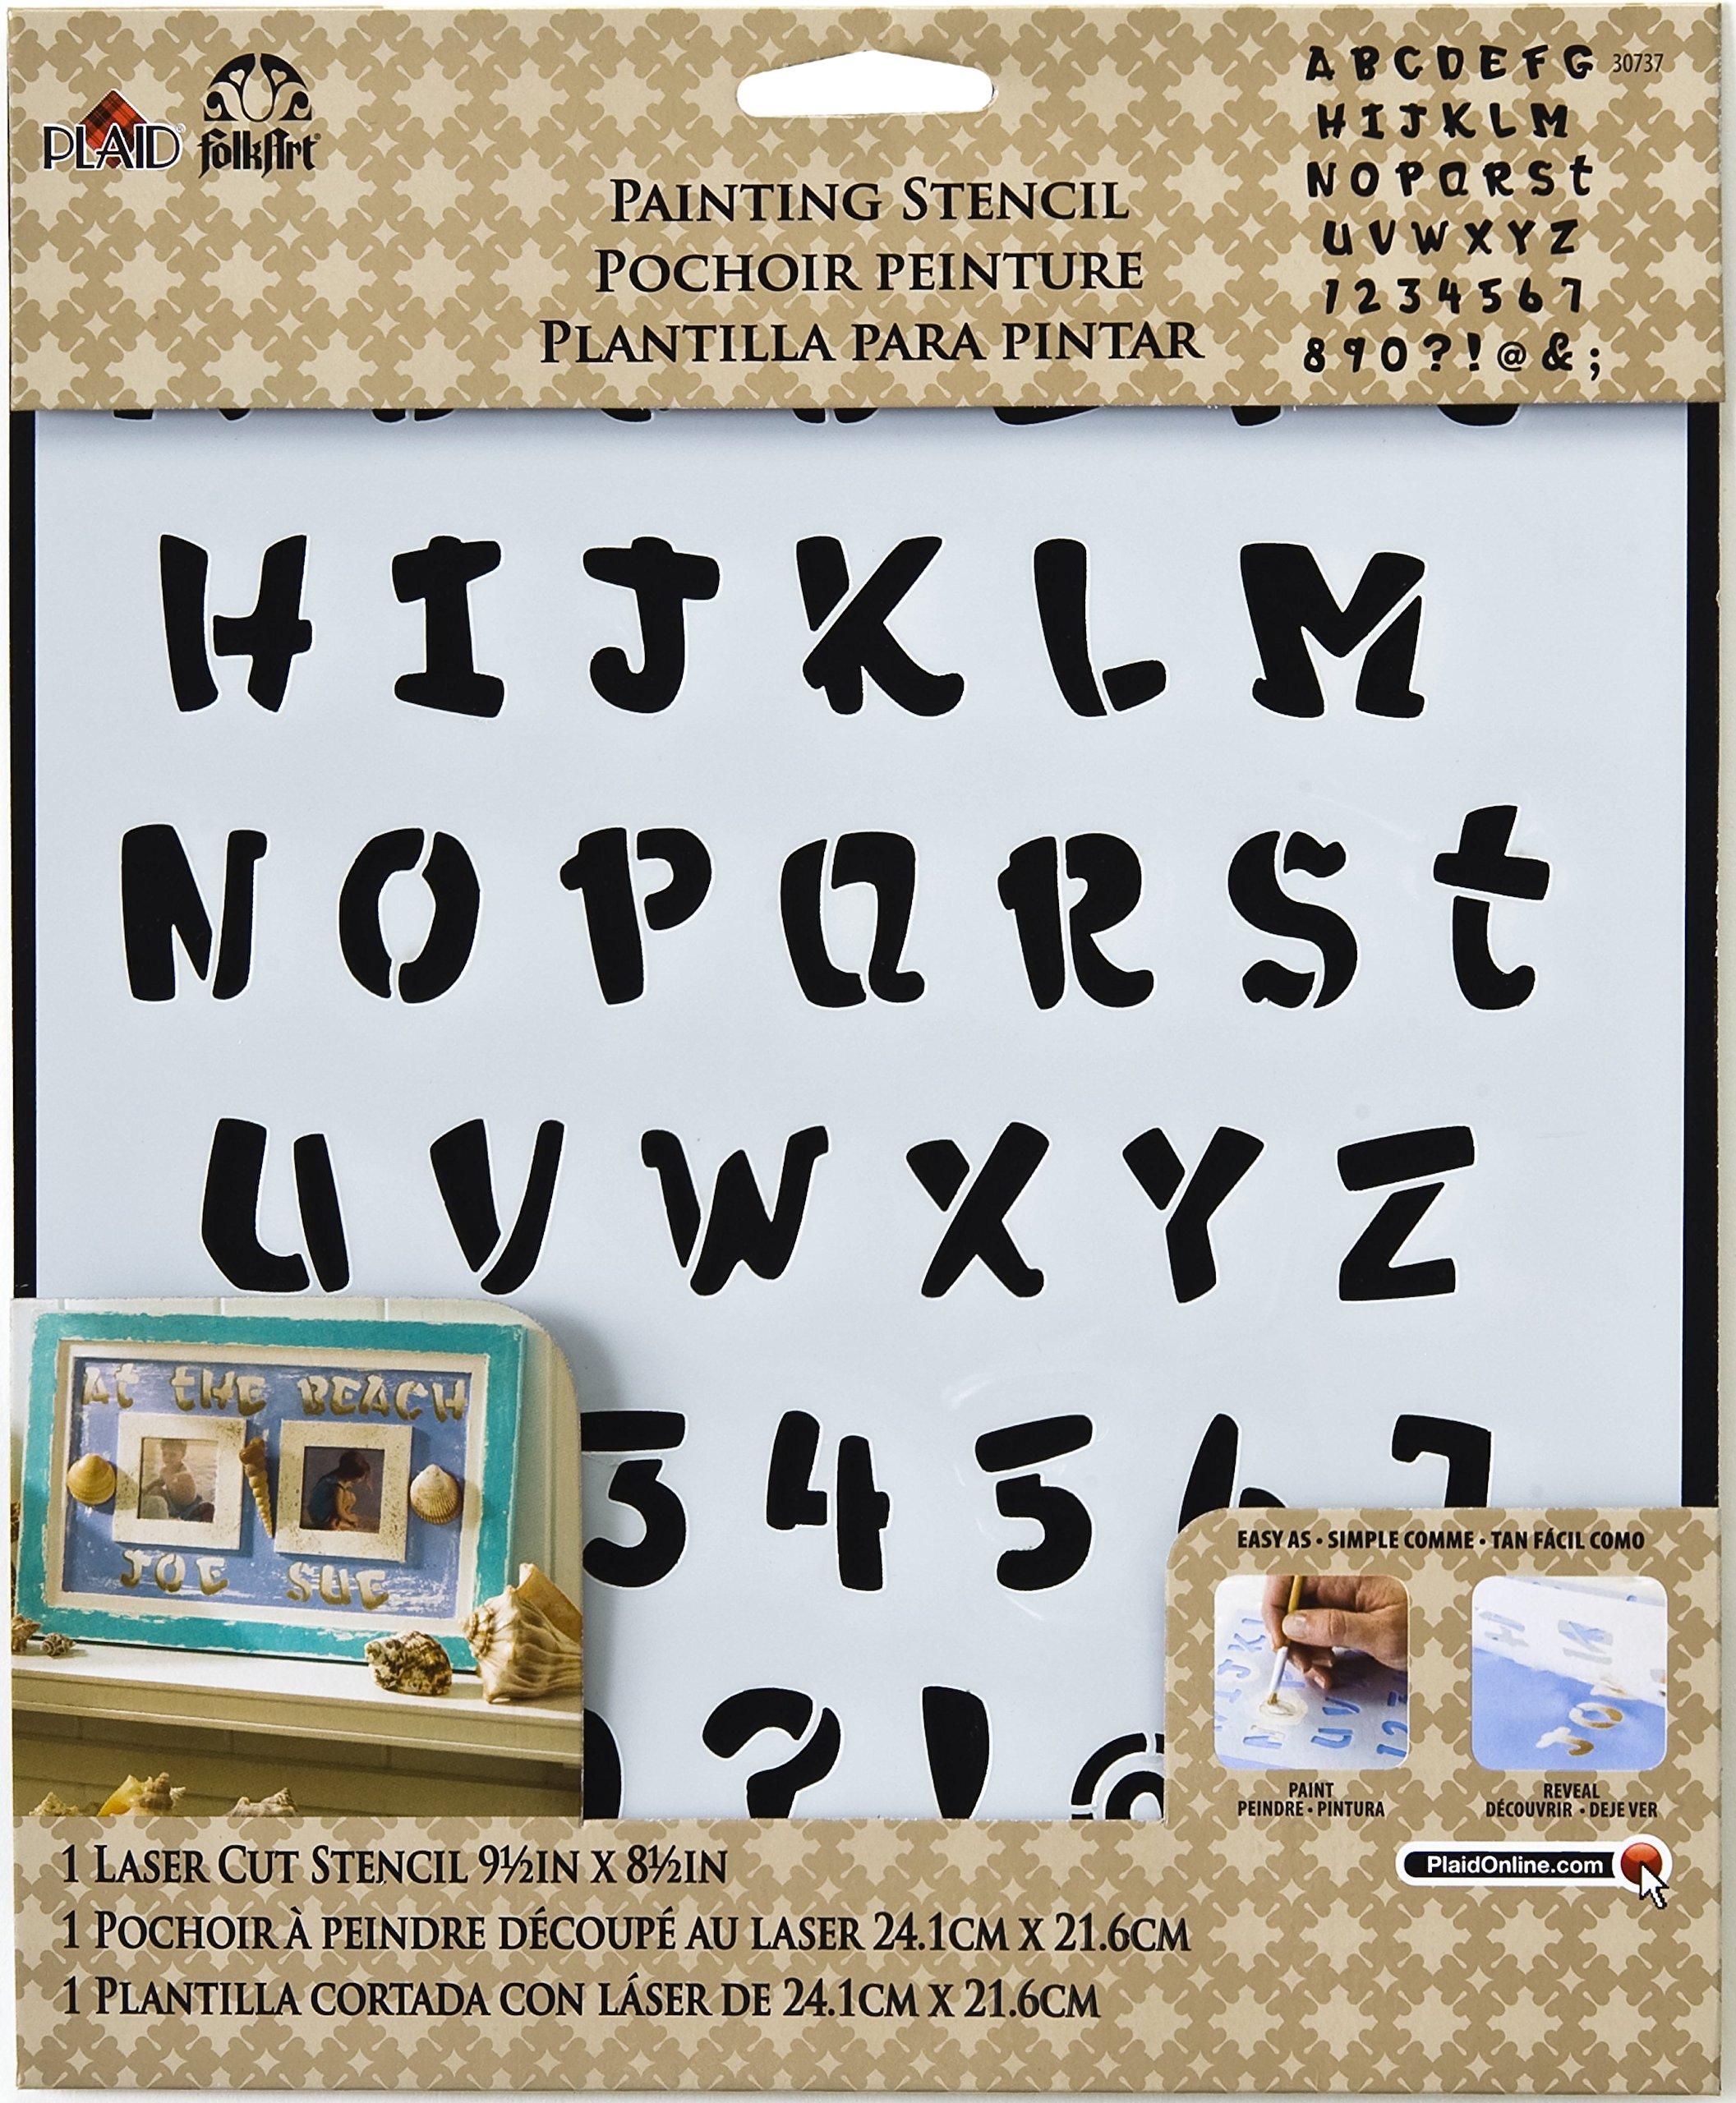 FolkArt Large Painting Stencil, 30737 Heavy Marker Alphabet